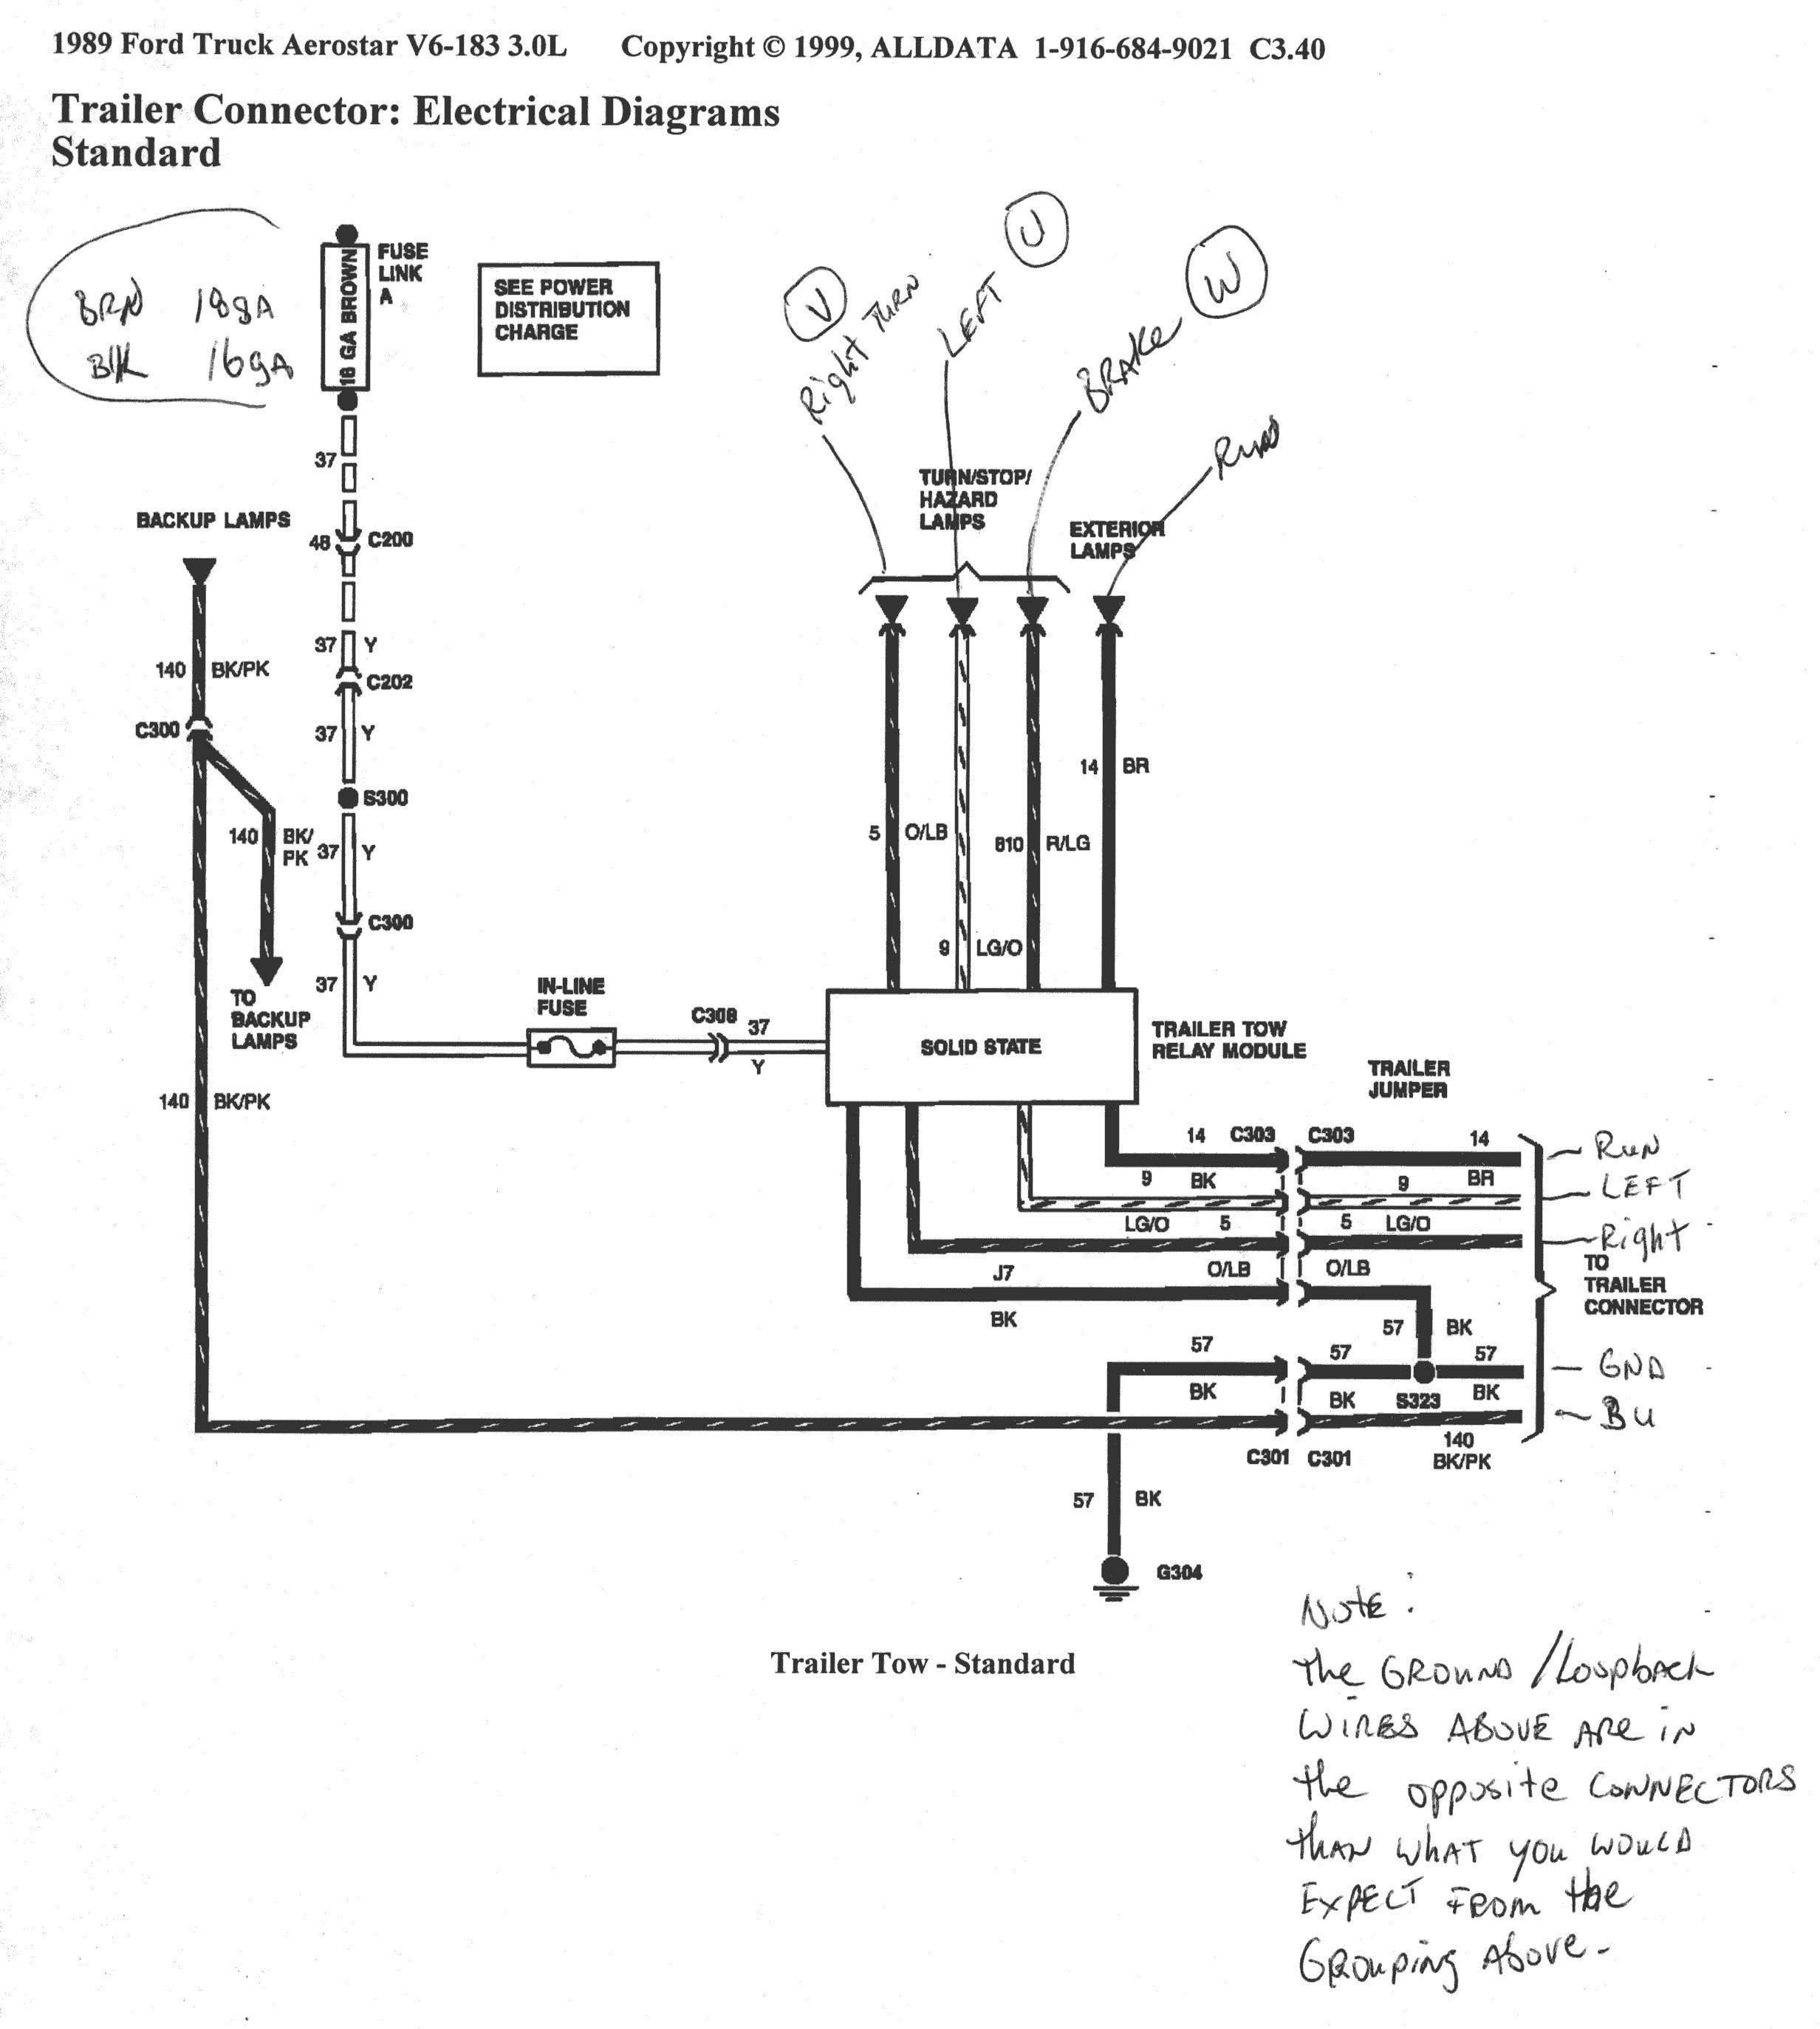 2005 Ford F350 Ke Light Wiring Diagram | Wiring Diagram  F Steering Column Wiring Diagram on 89 f150 battery diagram, 1995 f150 parts diagram, 2000 f250 shifter parts diagram, 89 f150 transmission diagram, f250 steering diagram, 89 f150 ignition, 89 f150 fuse diagram, 89 f150 alternator diagram, ford steering parts diagram,